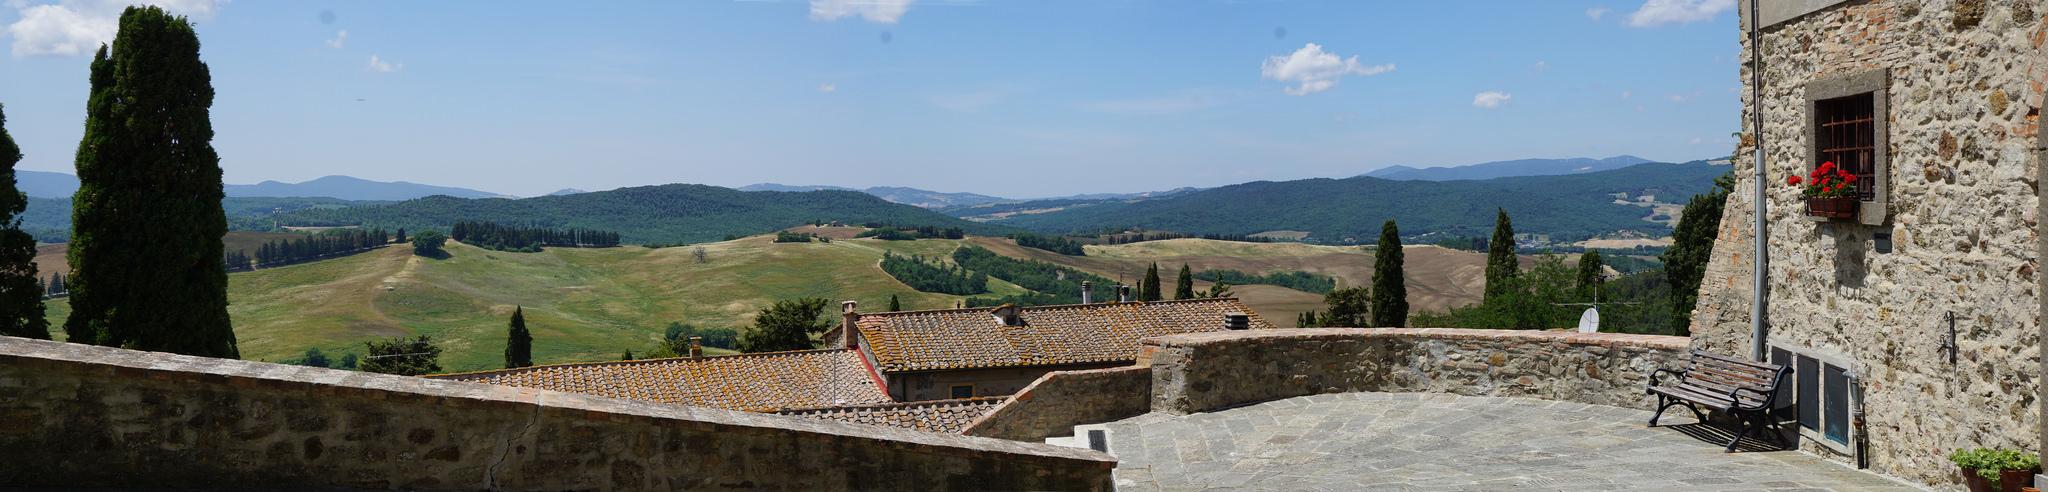 Montegemolo Toskania Tuscany Toscana panorama Val di Cecina